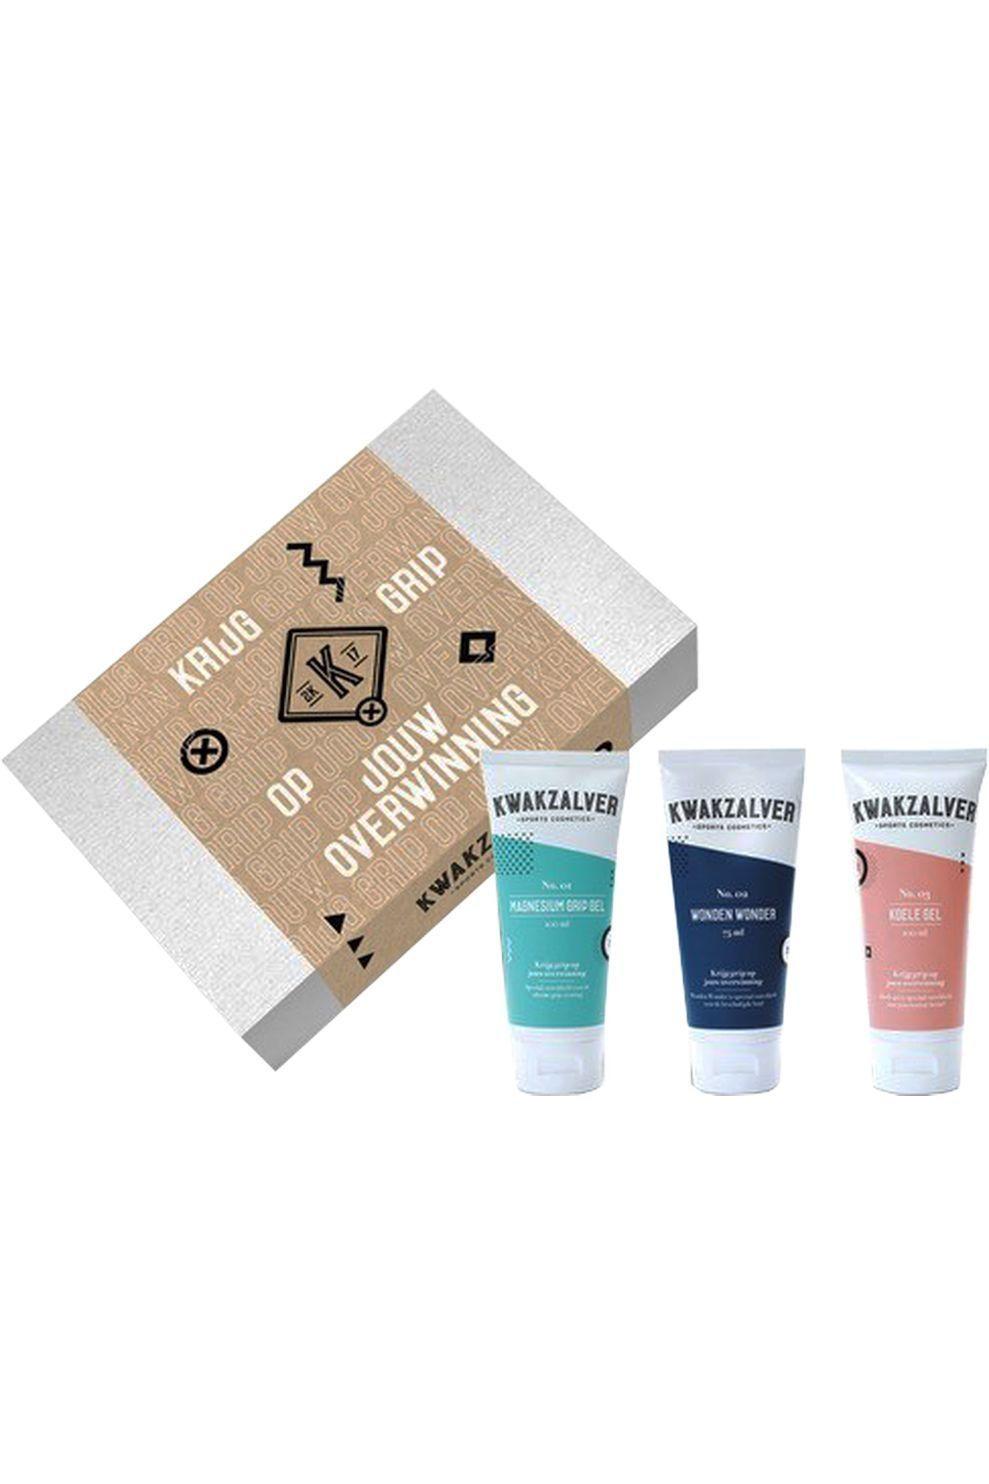 Kwakzalver Crème Giftbox De Klassieker